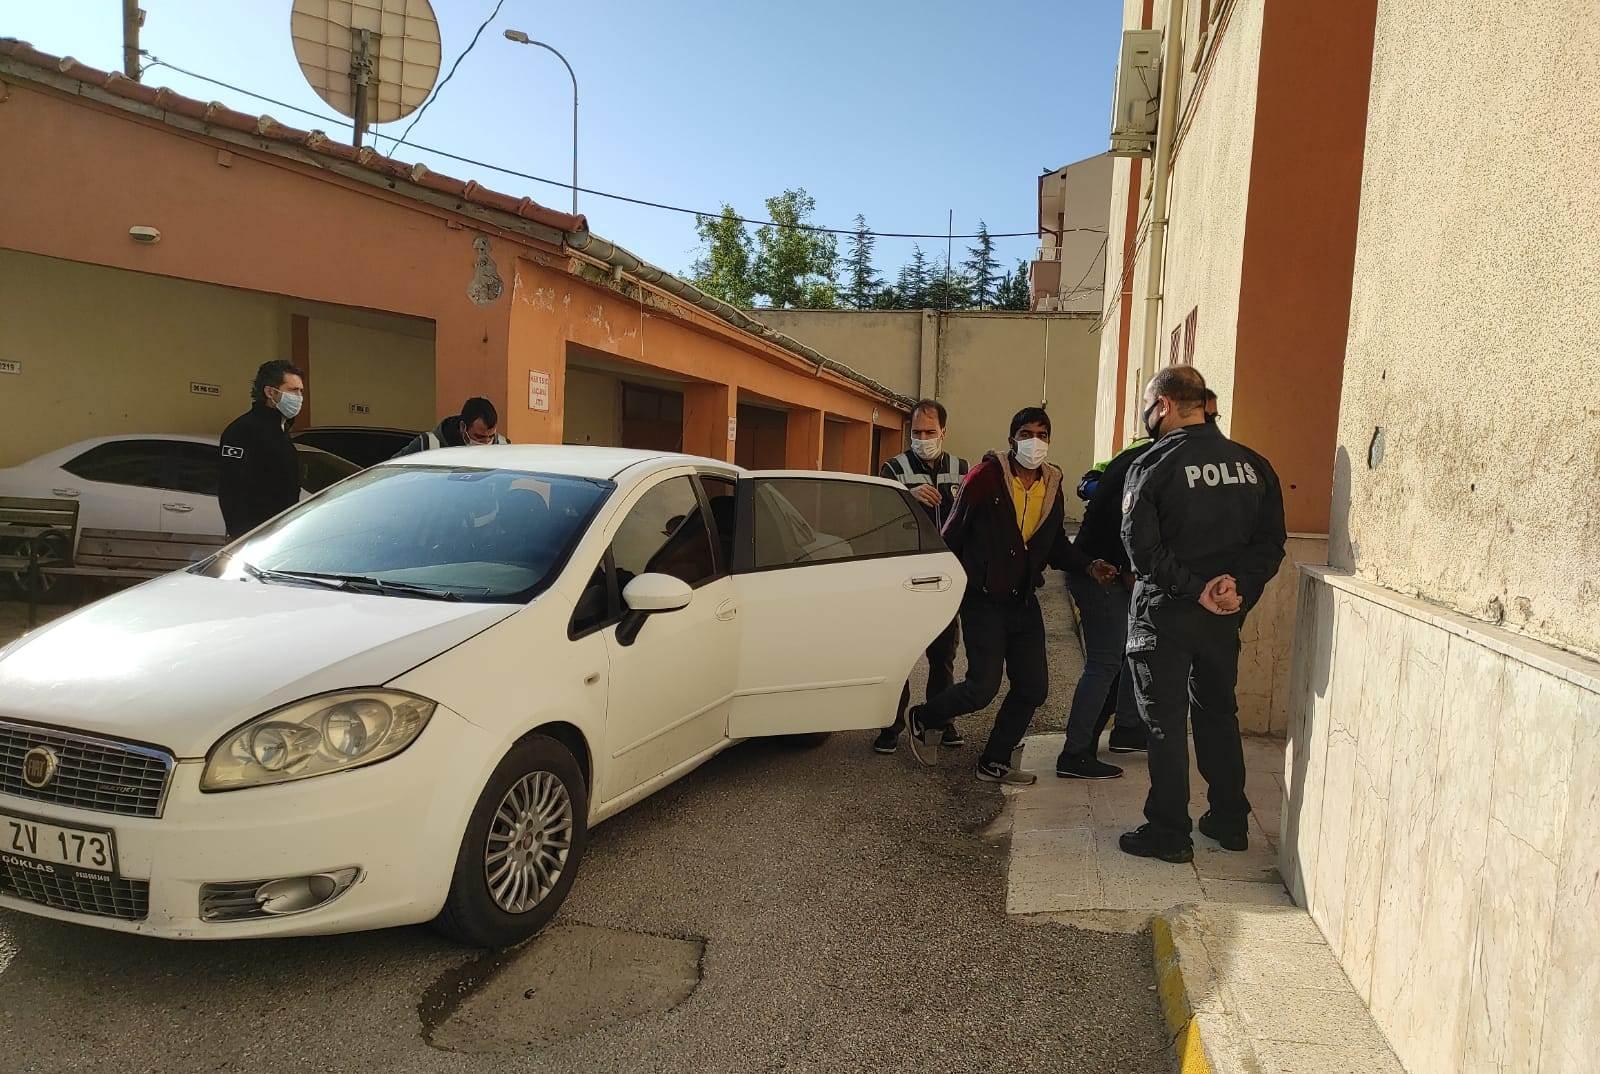 Konya'da, uyuşturucu operasyonunda; 4 tutuklama